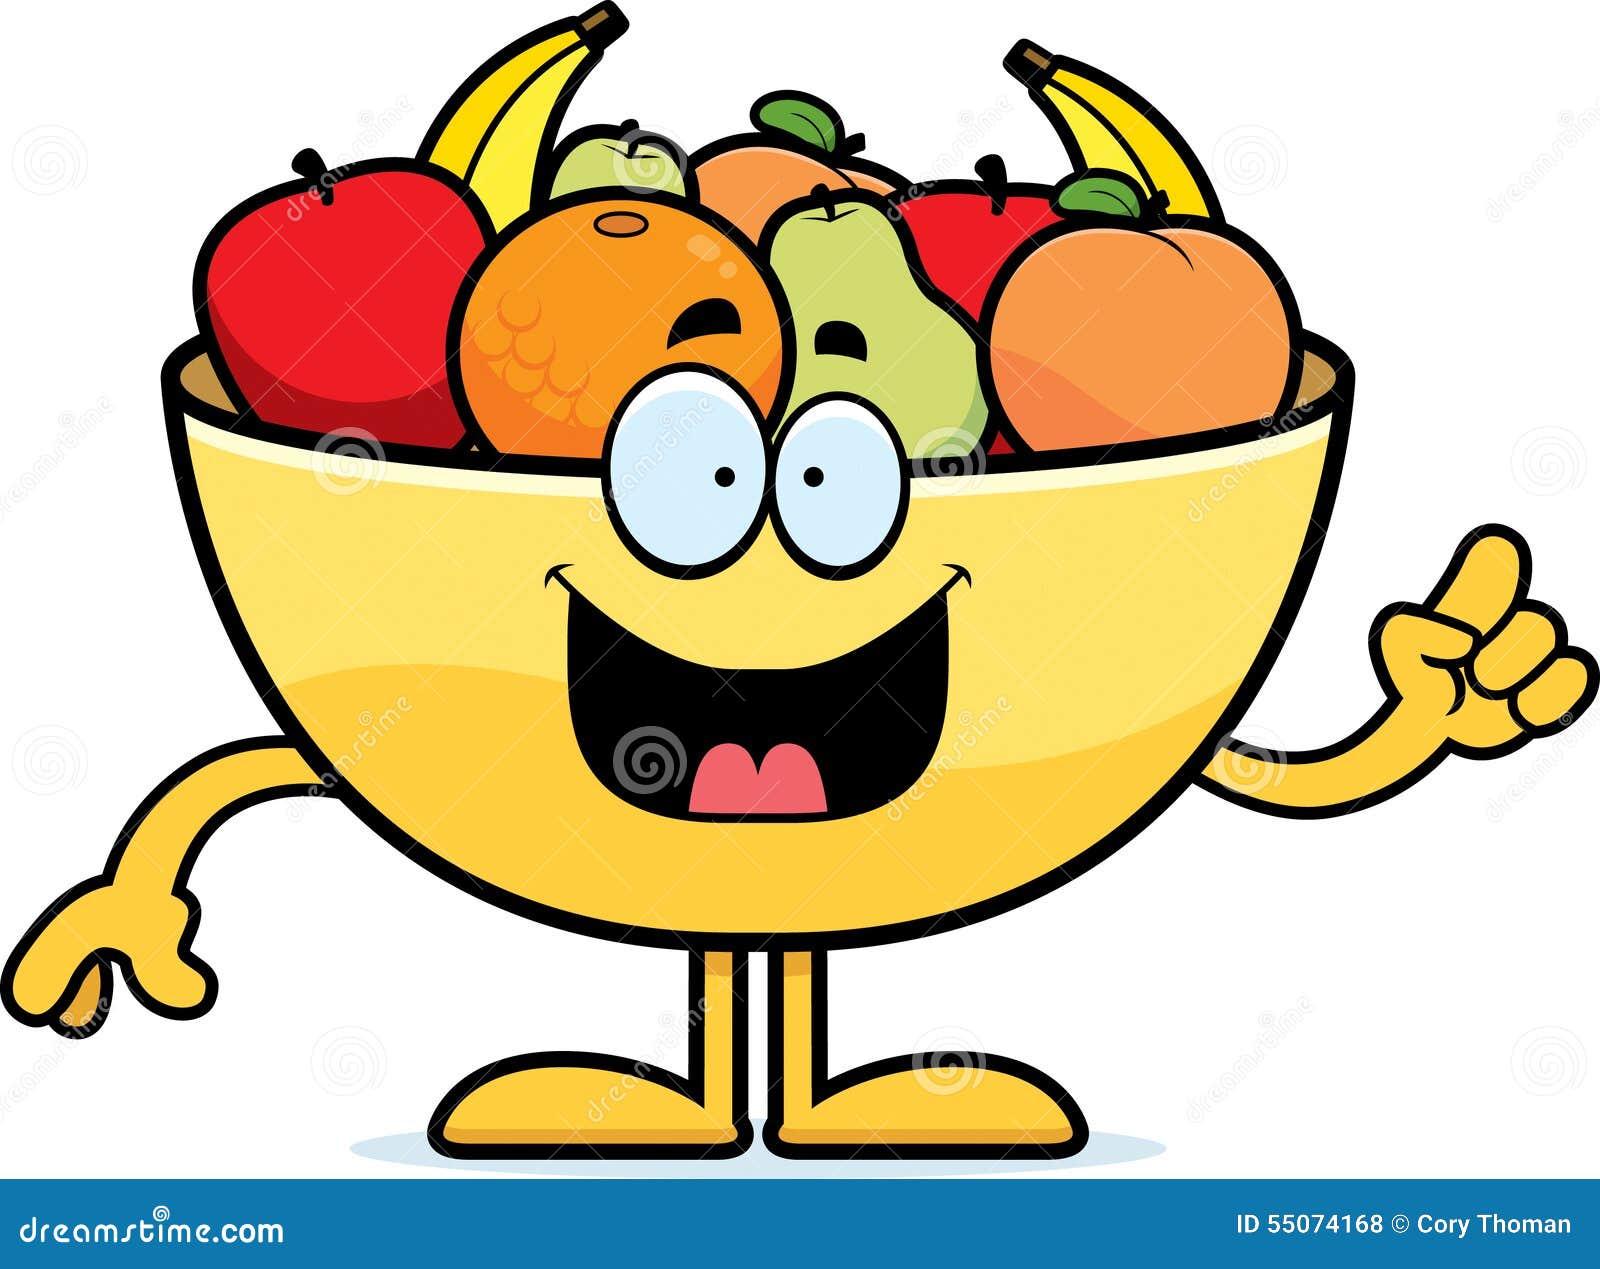 Cartoon Bowl of Fruit Idea stock vector. Illustration of ...